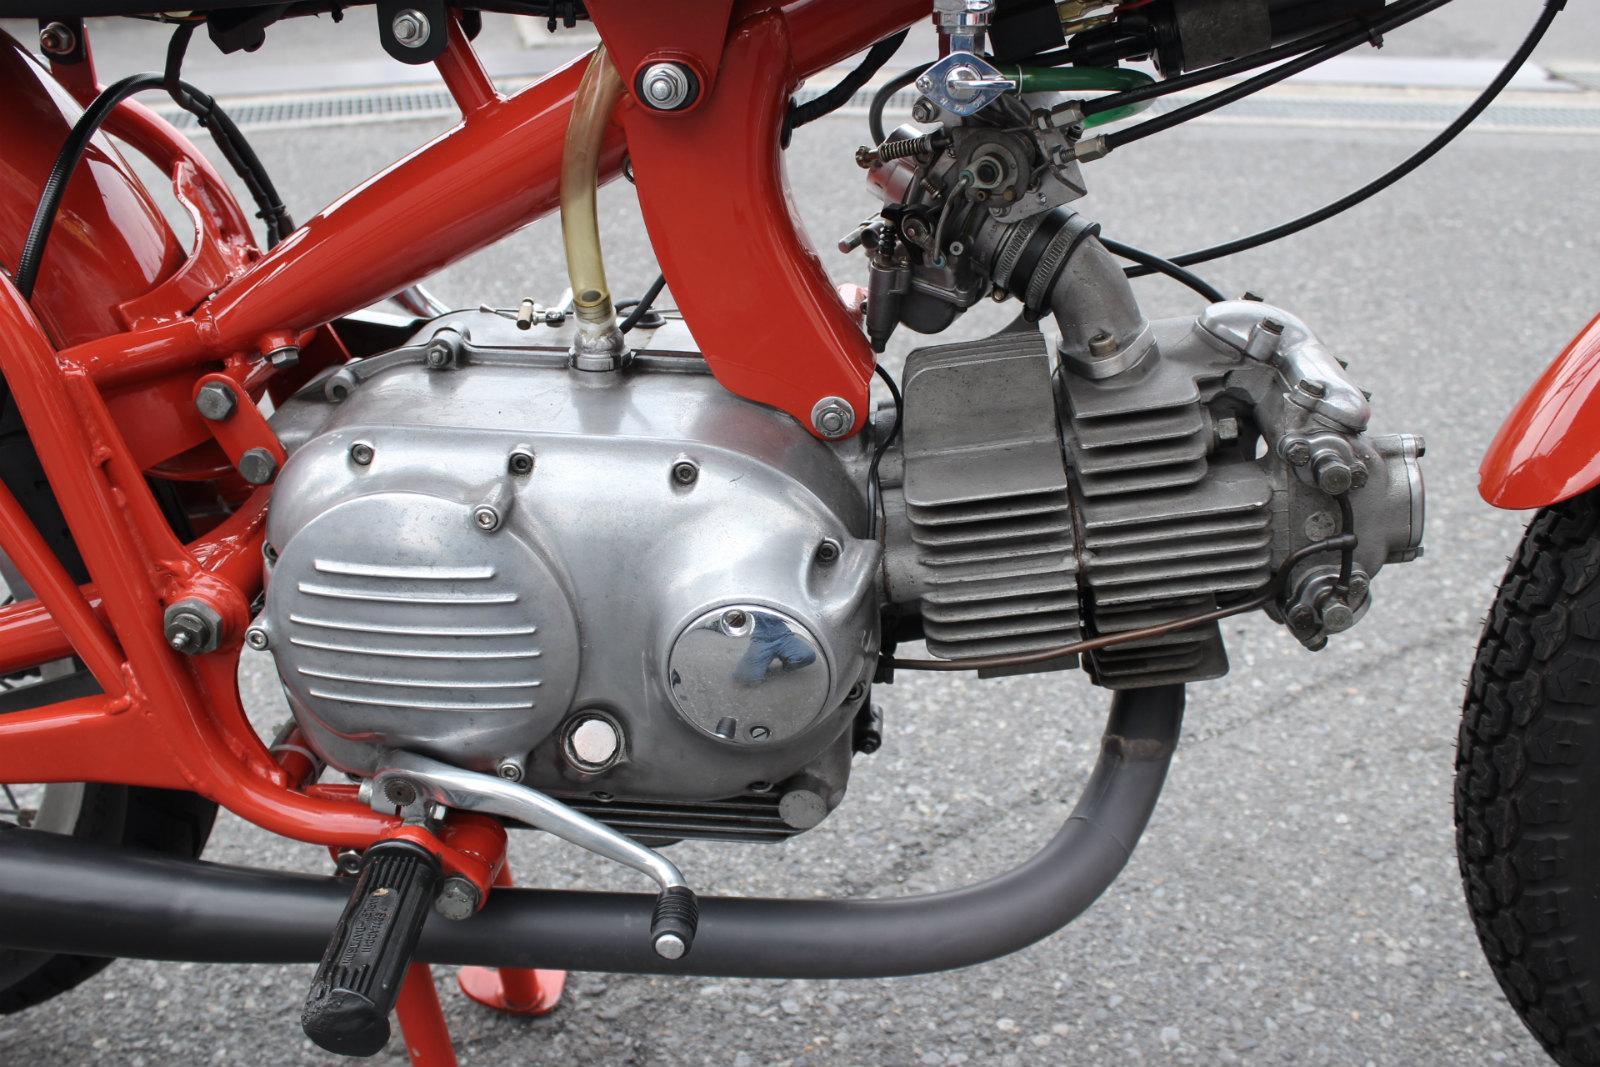 Harley Davidson Sprint_a0208987_1413742.jpg